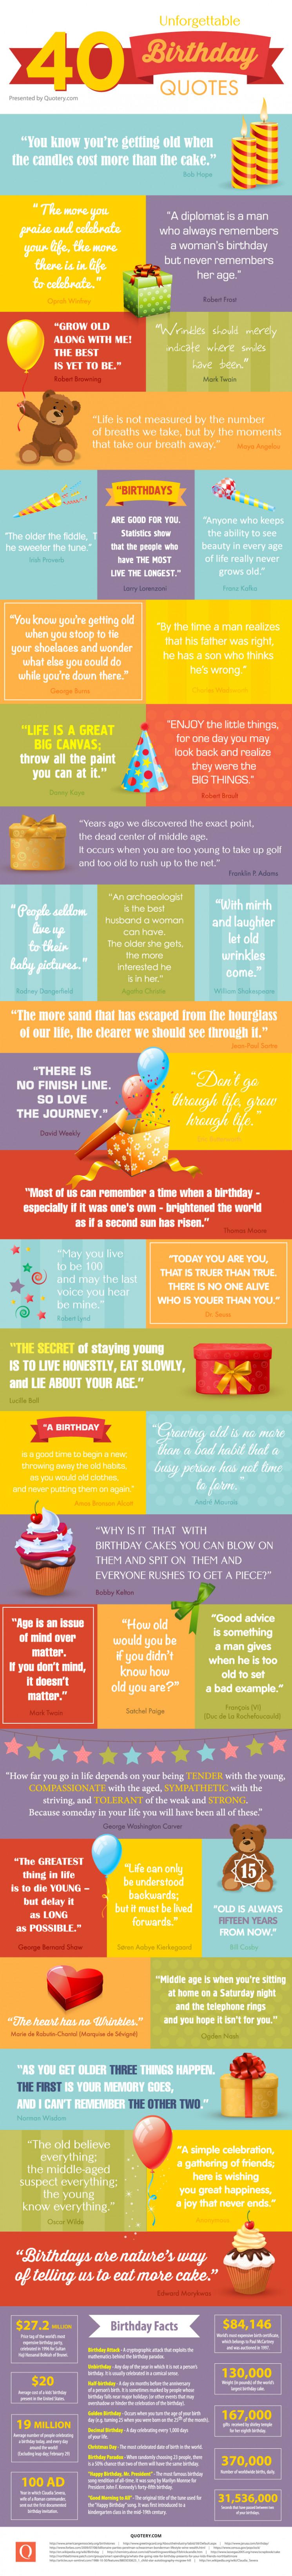 40 Unforgettable Birthday Quotes